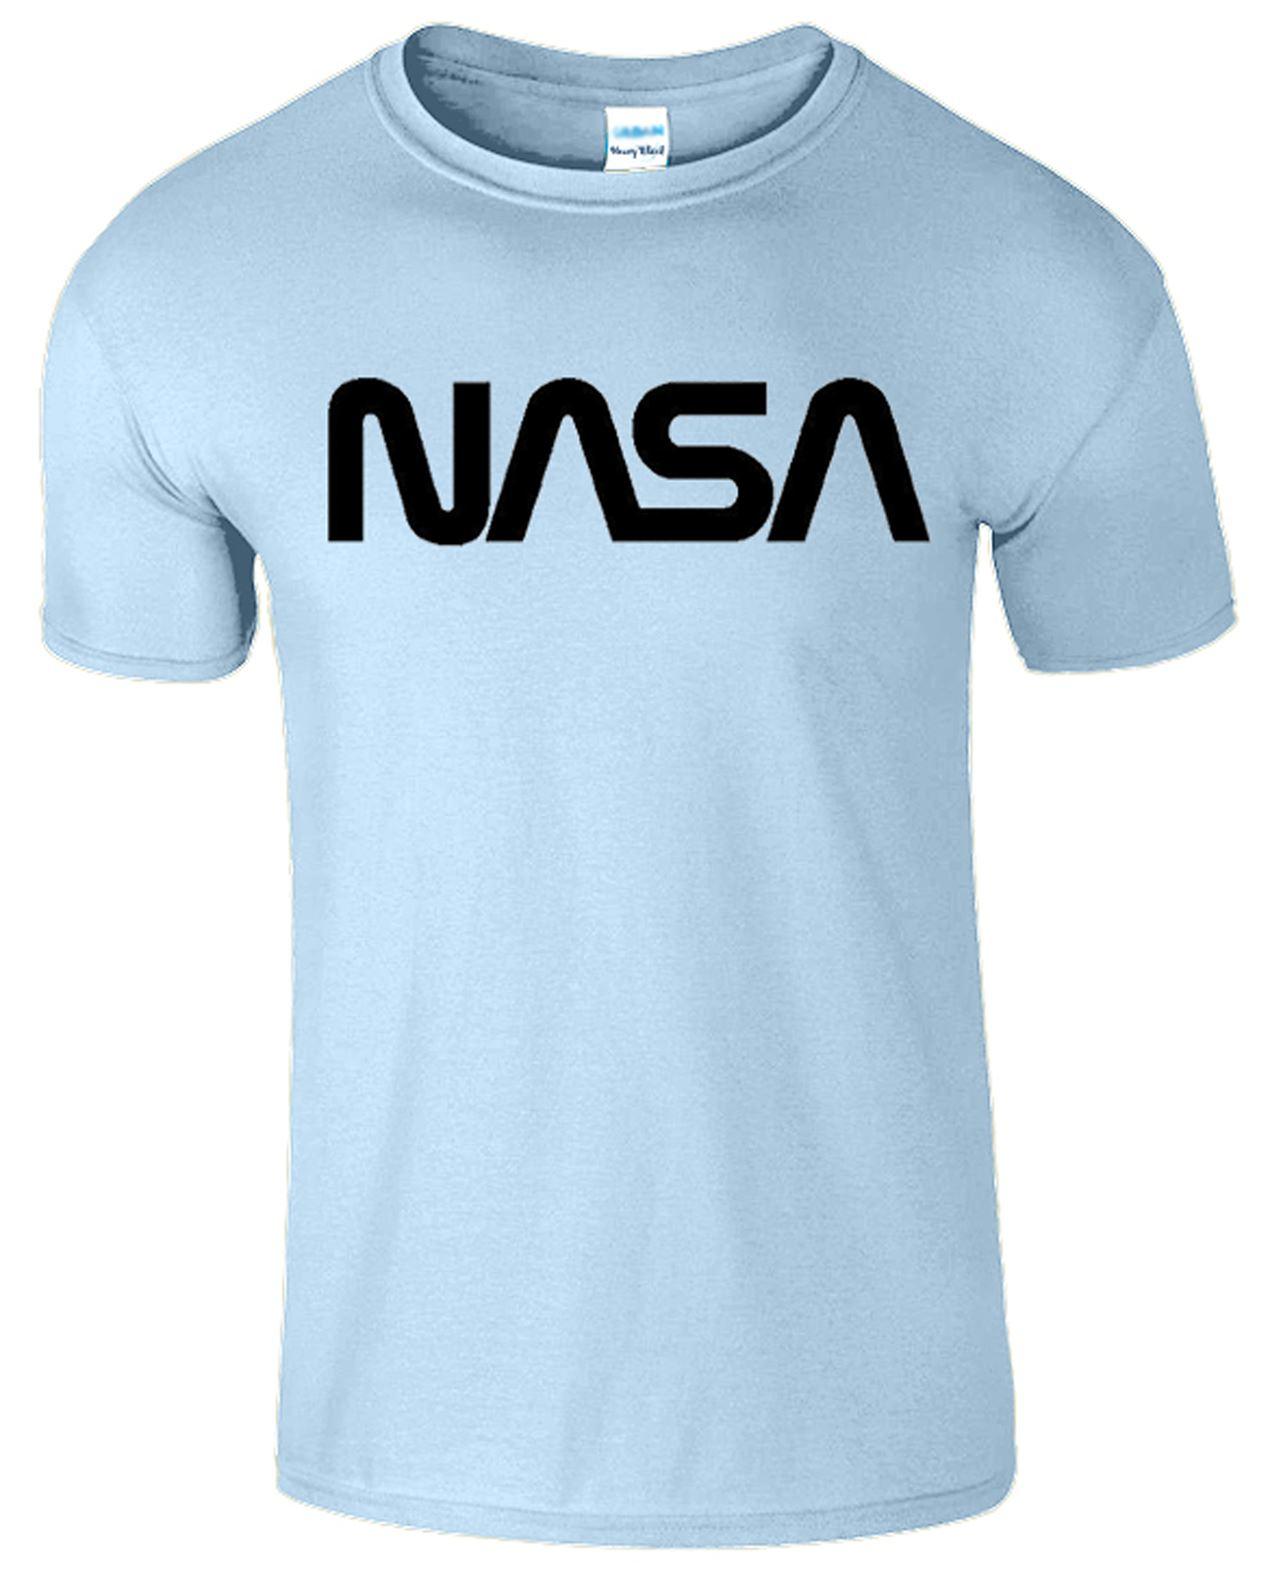 astronaut space t shirt - photo #34